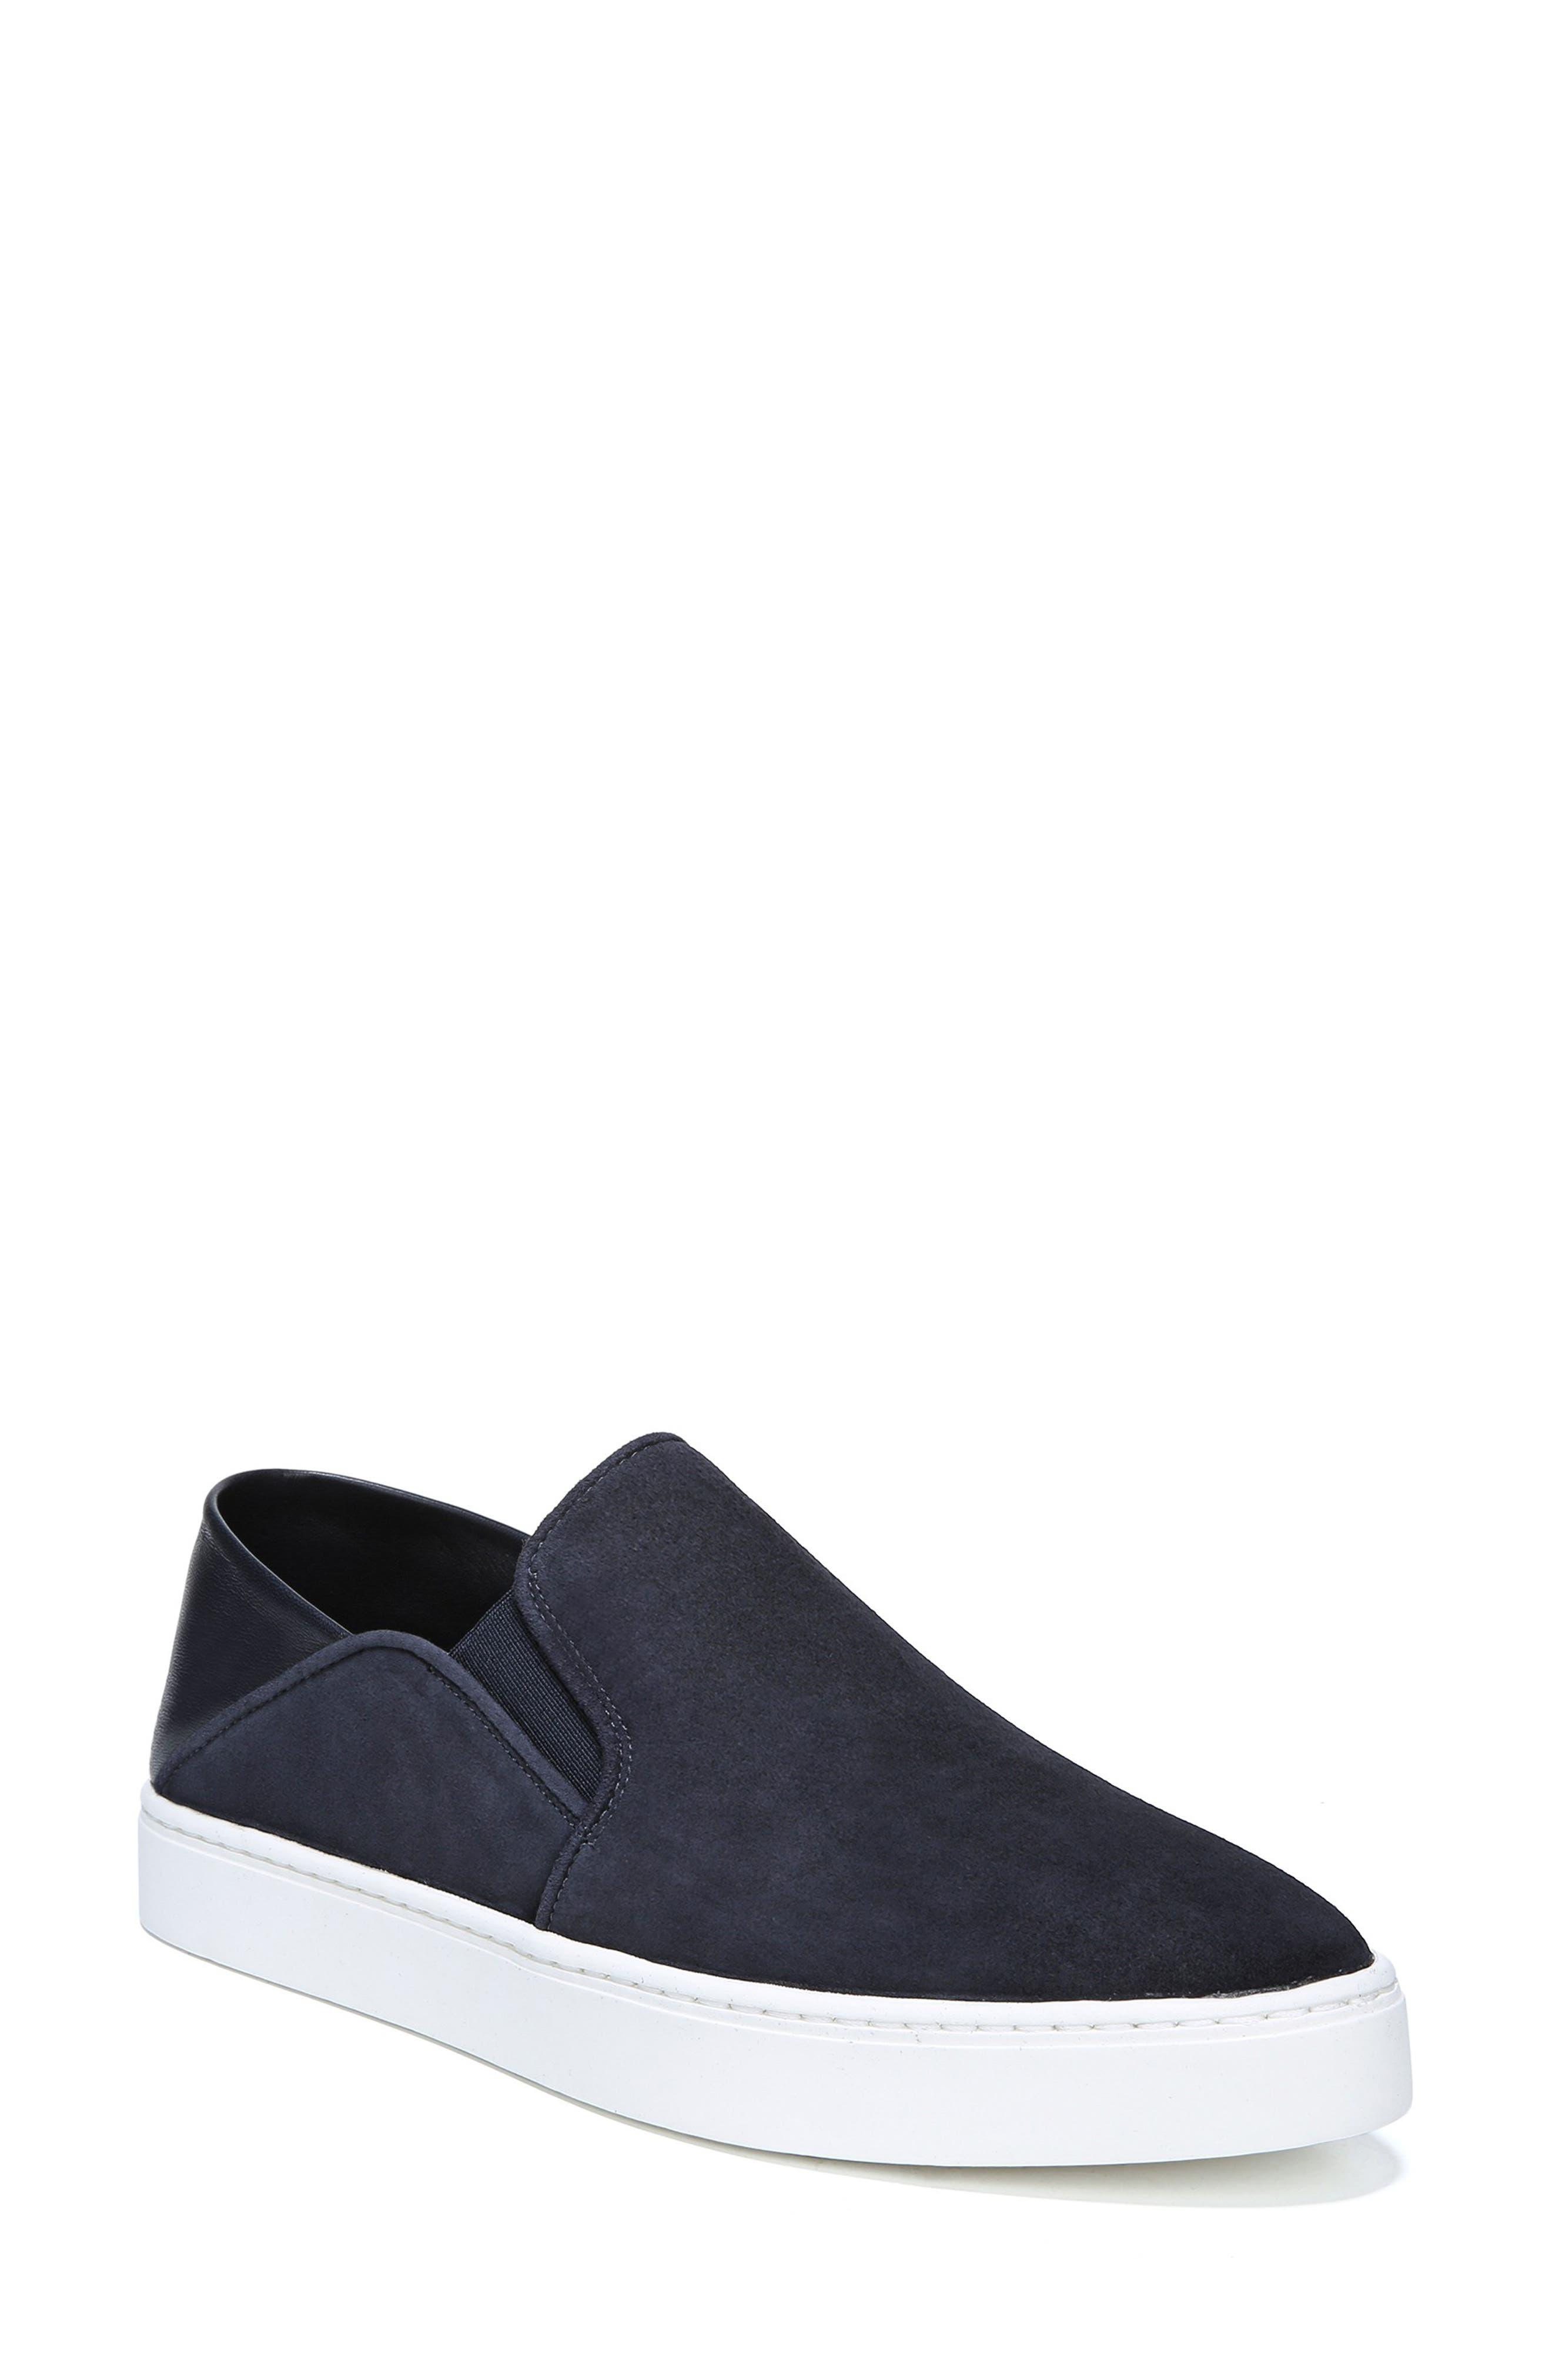 VINCE Garvey Slip-On Sneaker, Main, color, COASTAL